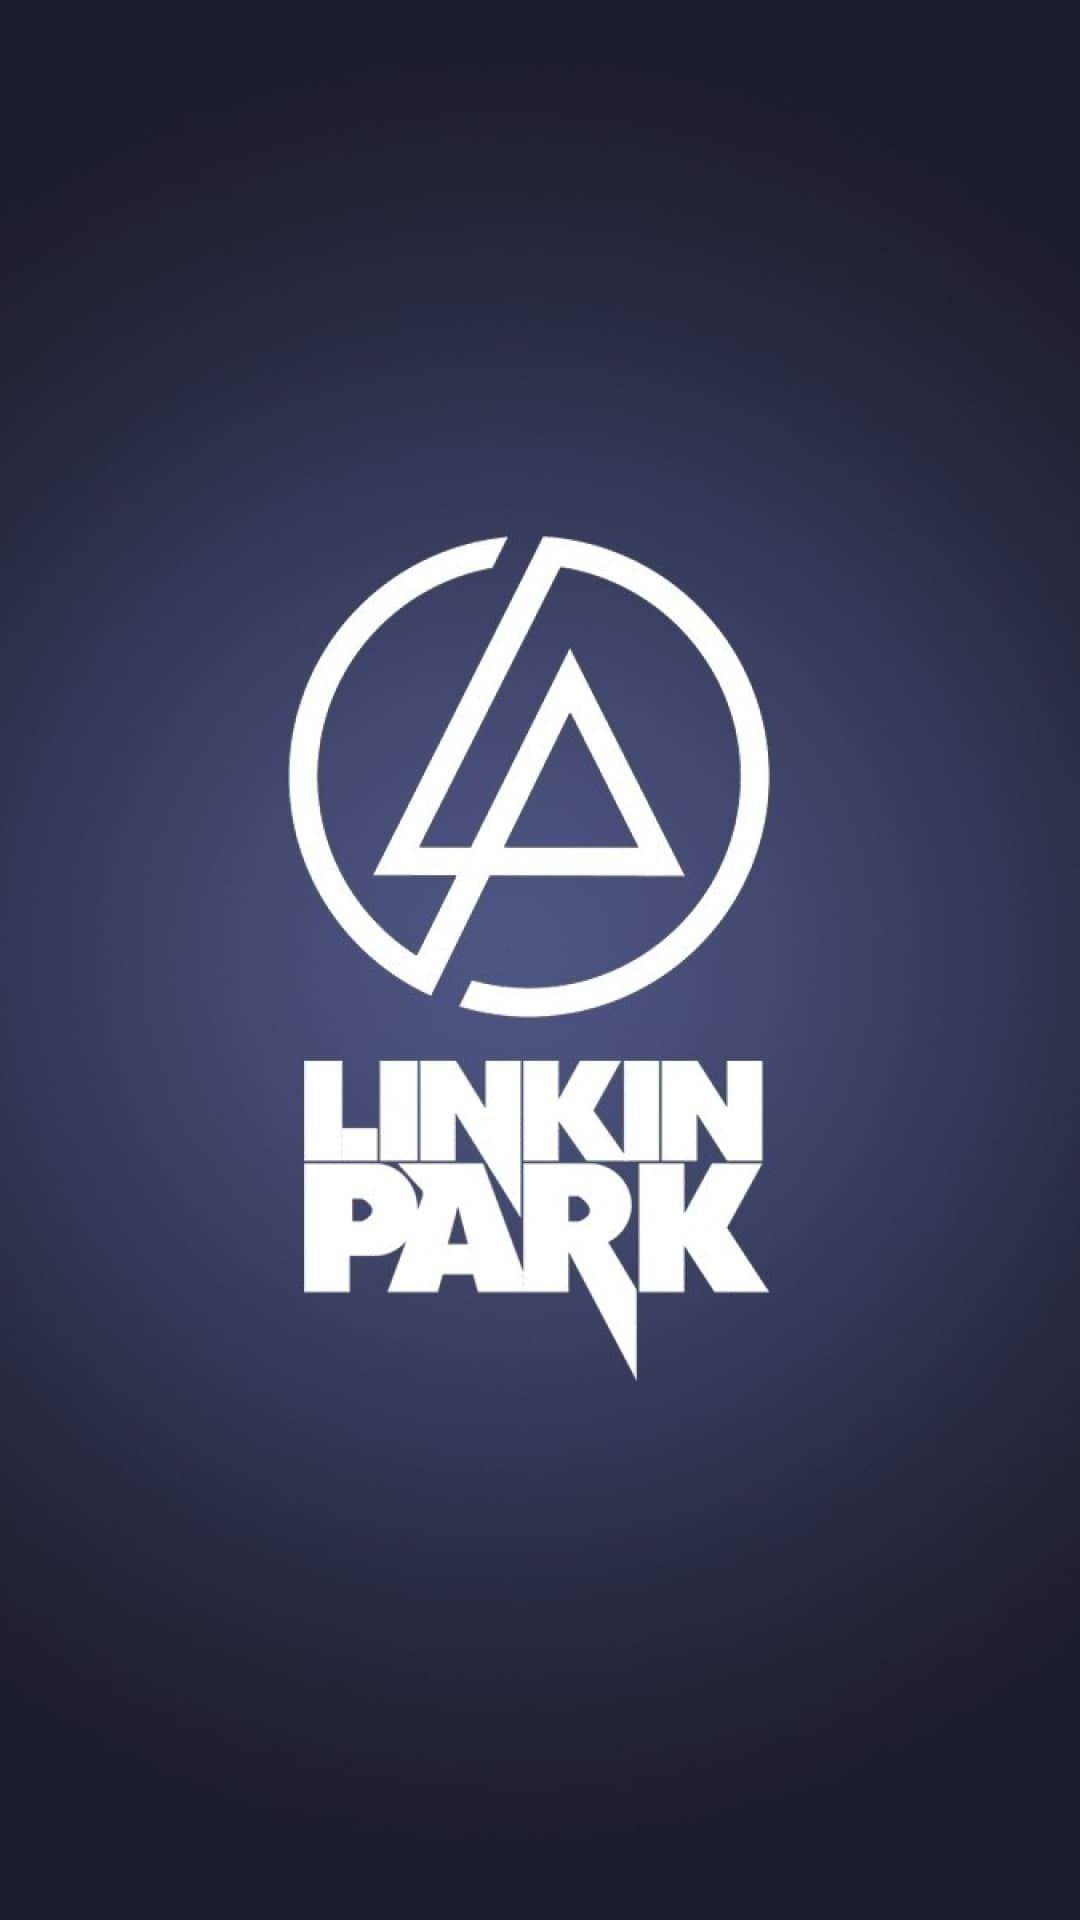 Http Stockwallpapers Org 16132 Linkin Park Wallpaper For Android